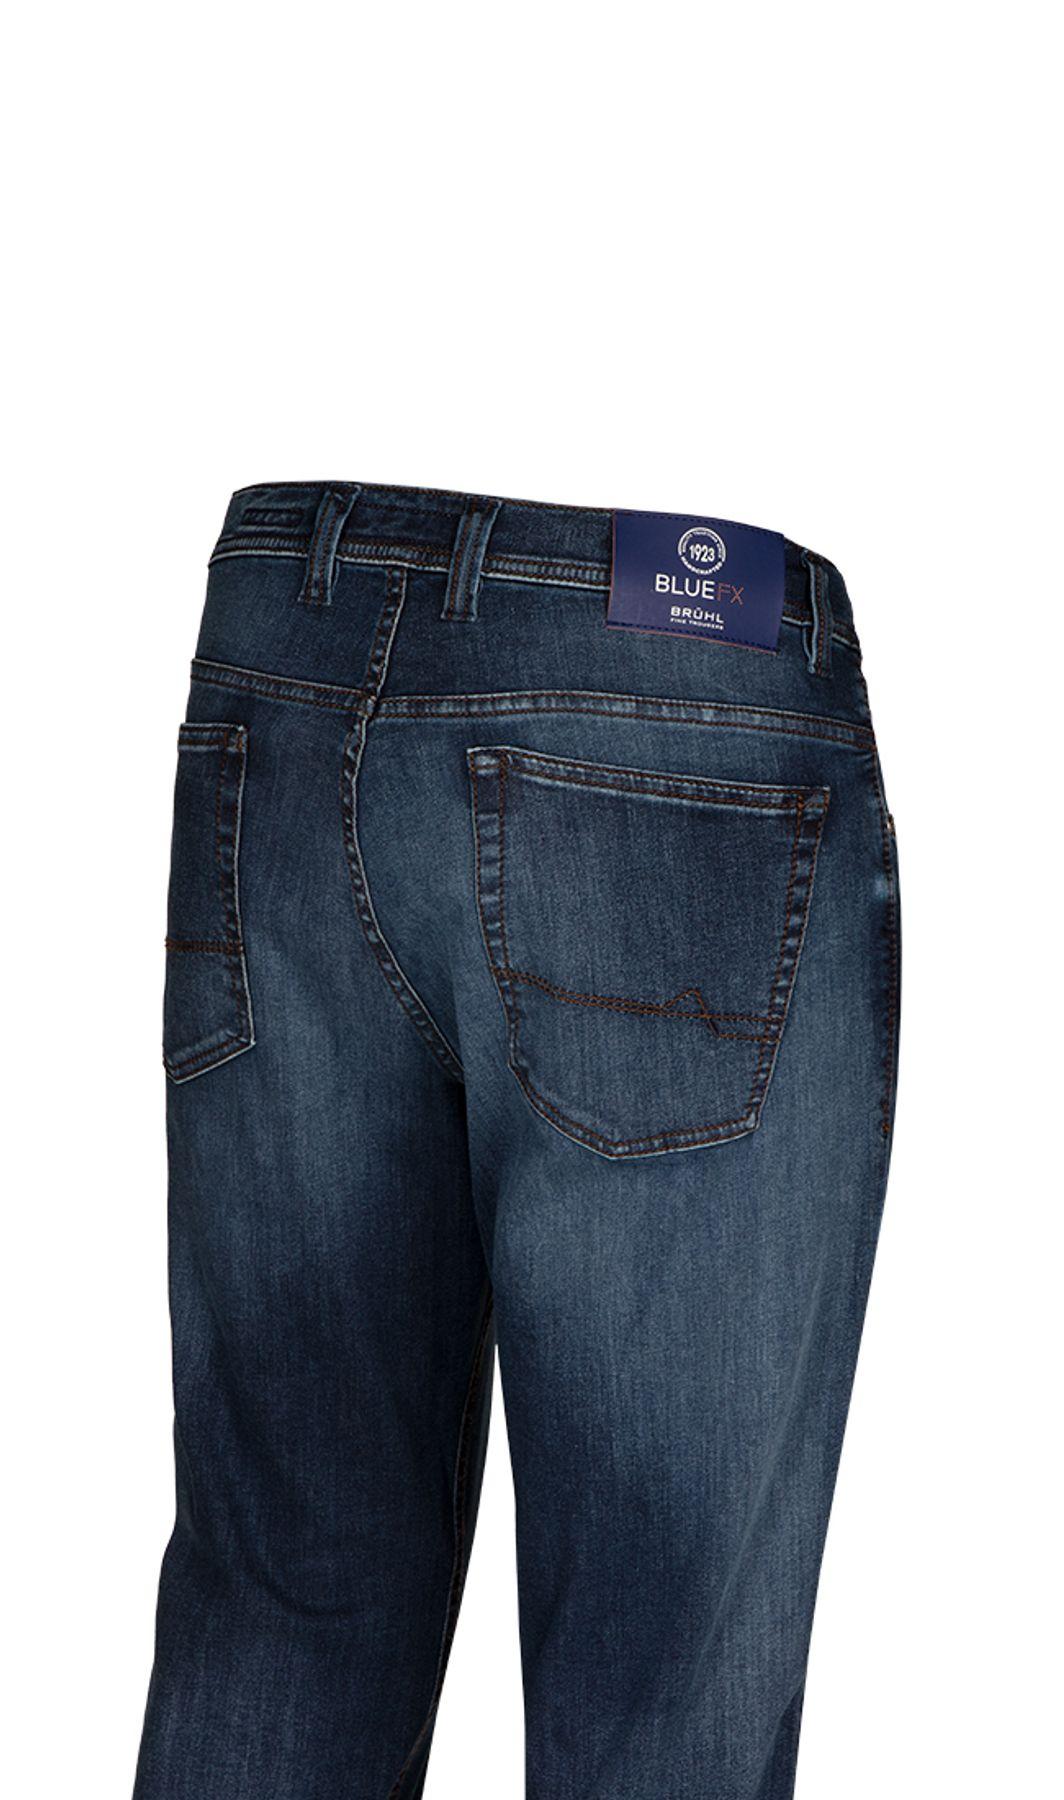 Brühl - Comfort Fit - Herren 5-Pocket Jeans in blau, York DO FX (0817191241100) – Bild 3